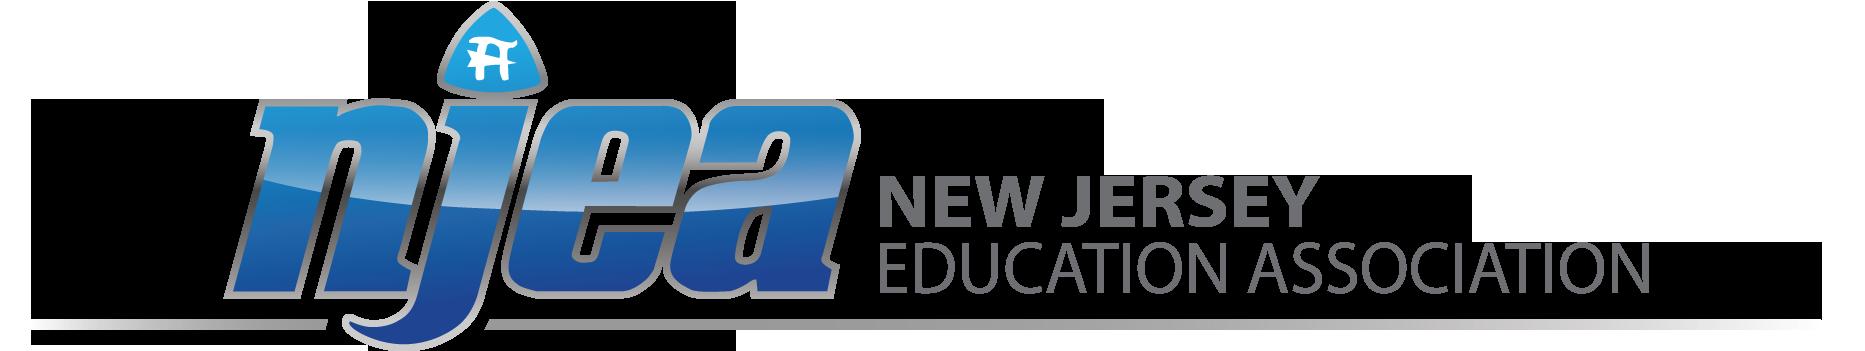 NJEA-logo.png